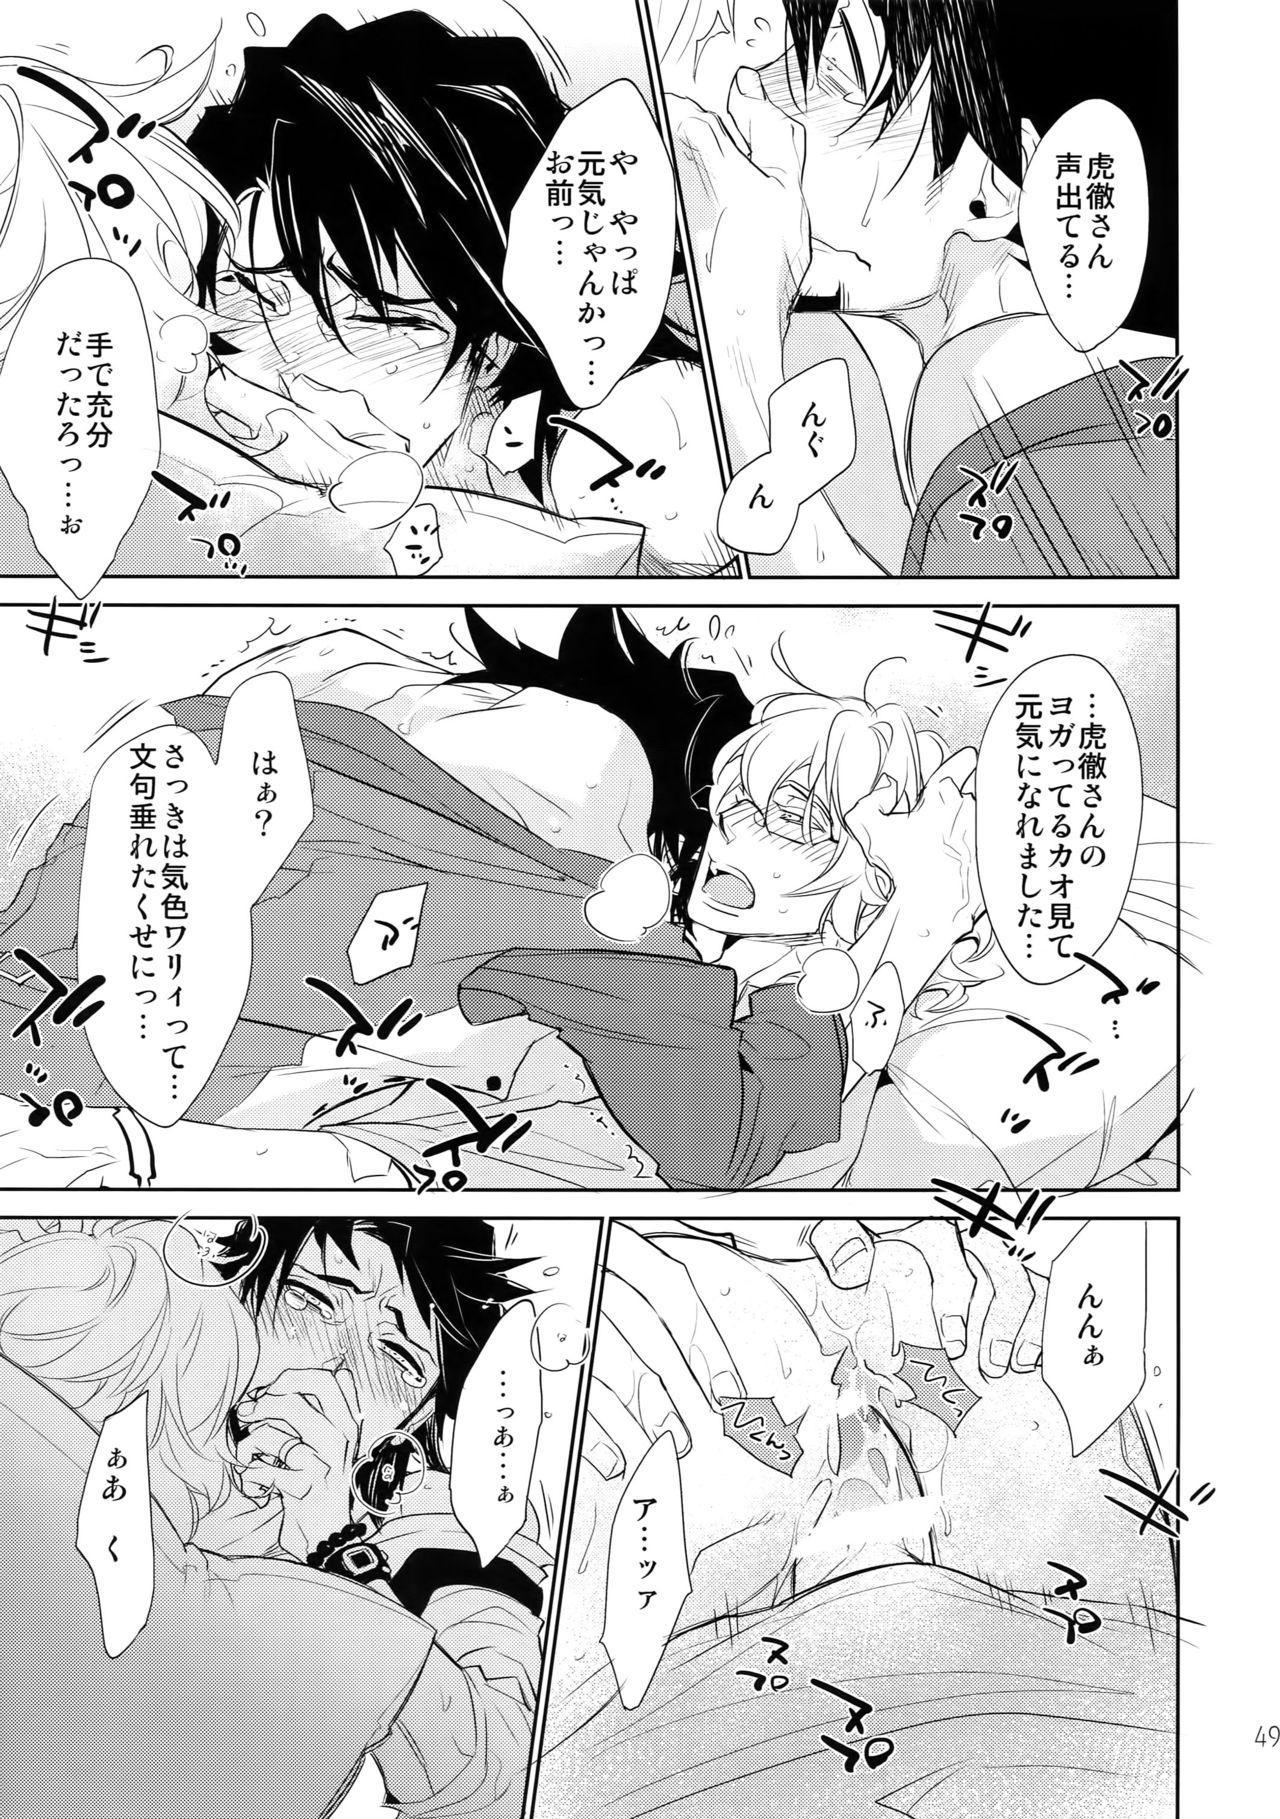 T&B Sairoku! 2 47